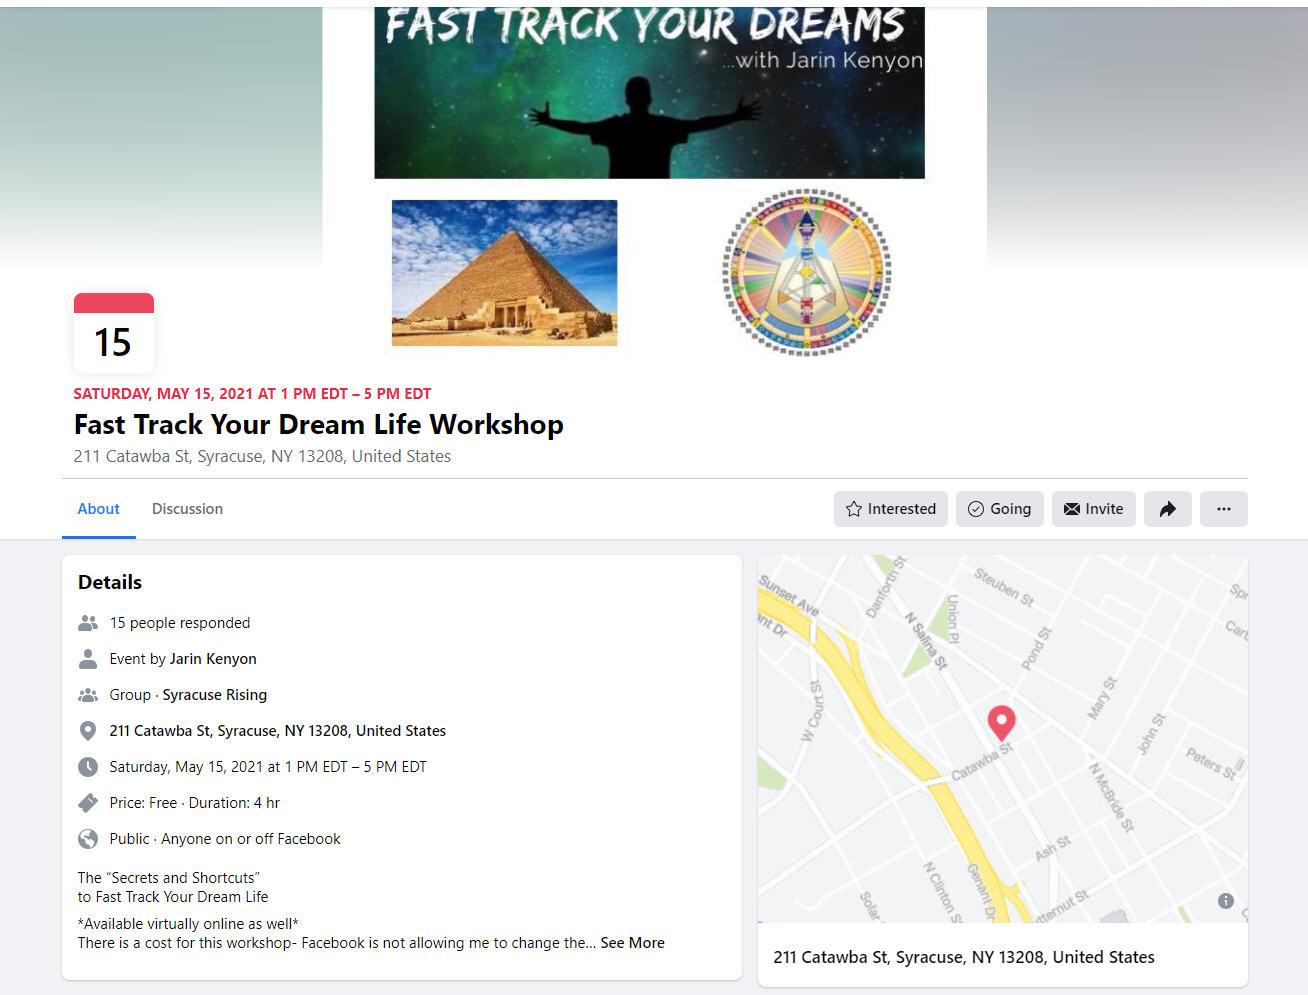 Fast Track Your Dream Life Workshop Jarin Kenyon